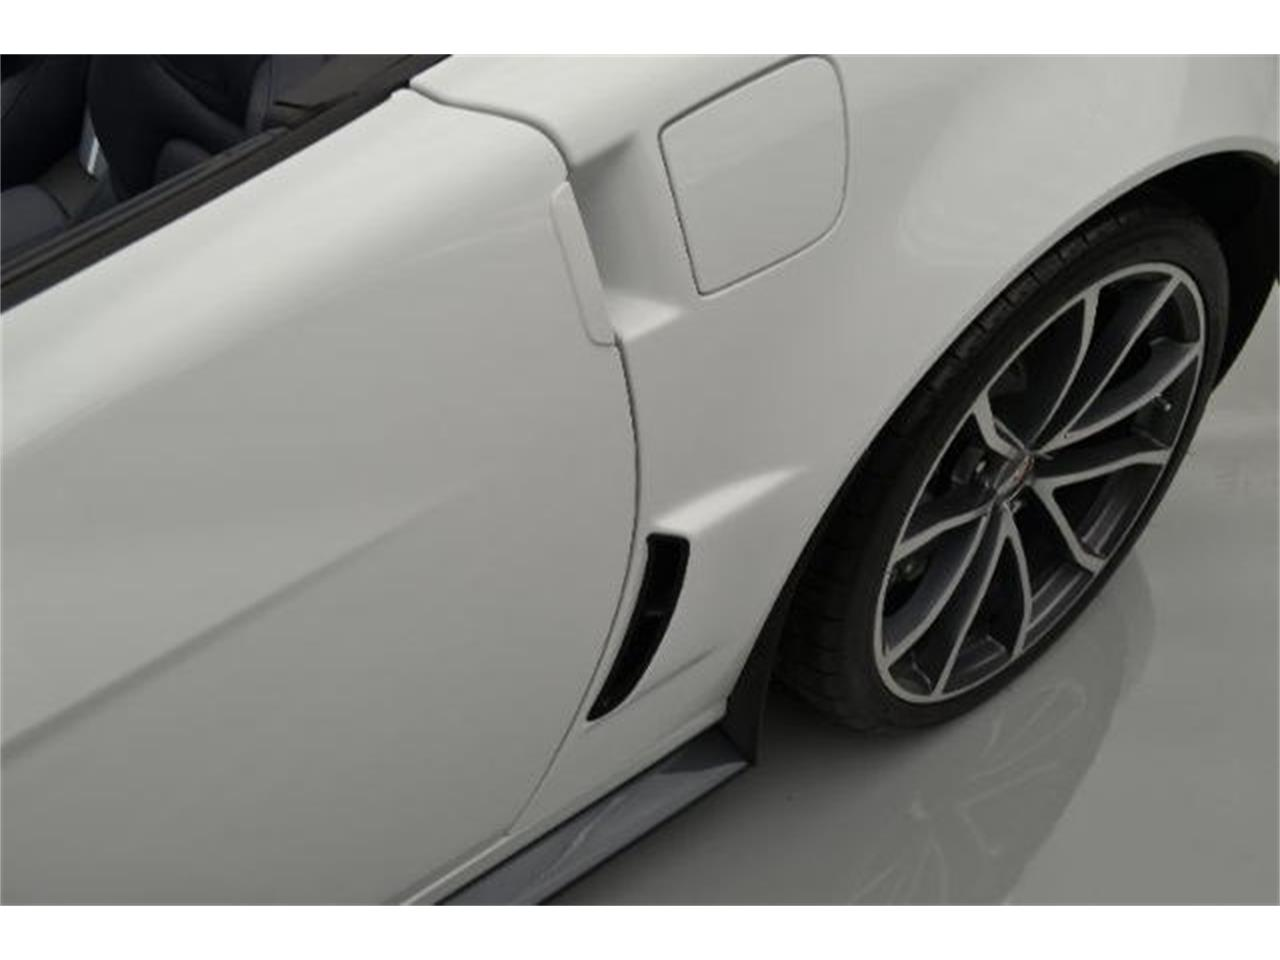 Large Picture of '13 Chevrolet Corvette located in North Carolina - $96,000.00 - 8QFQ